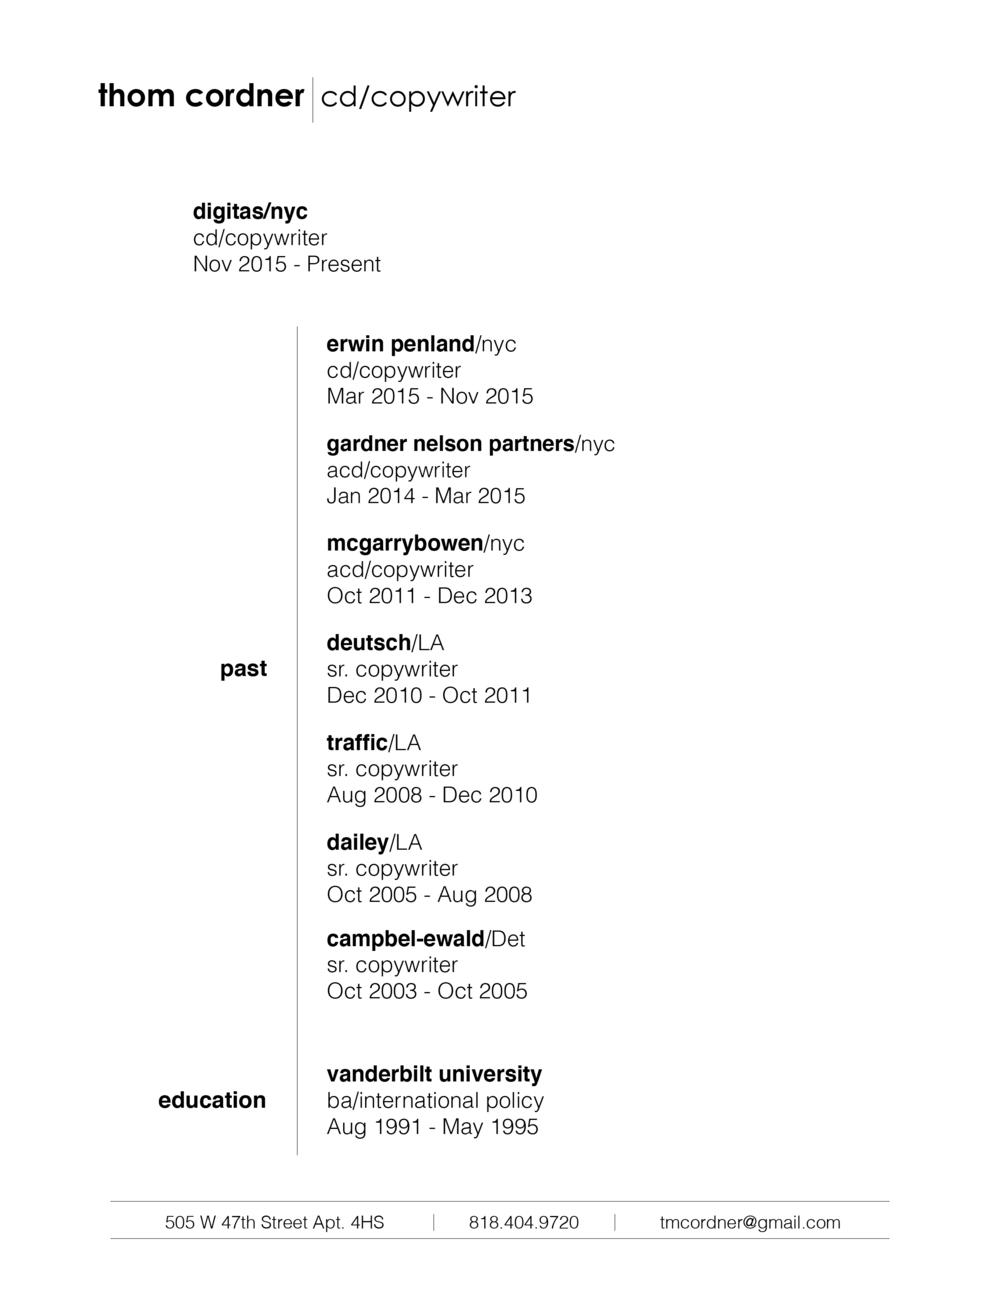 cordner_resume_032017.png